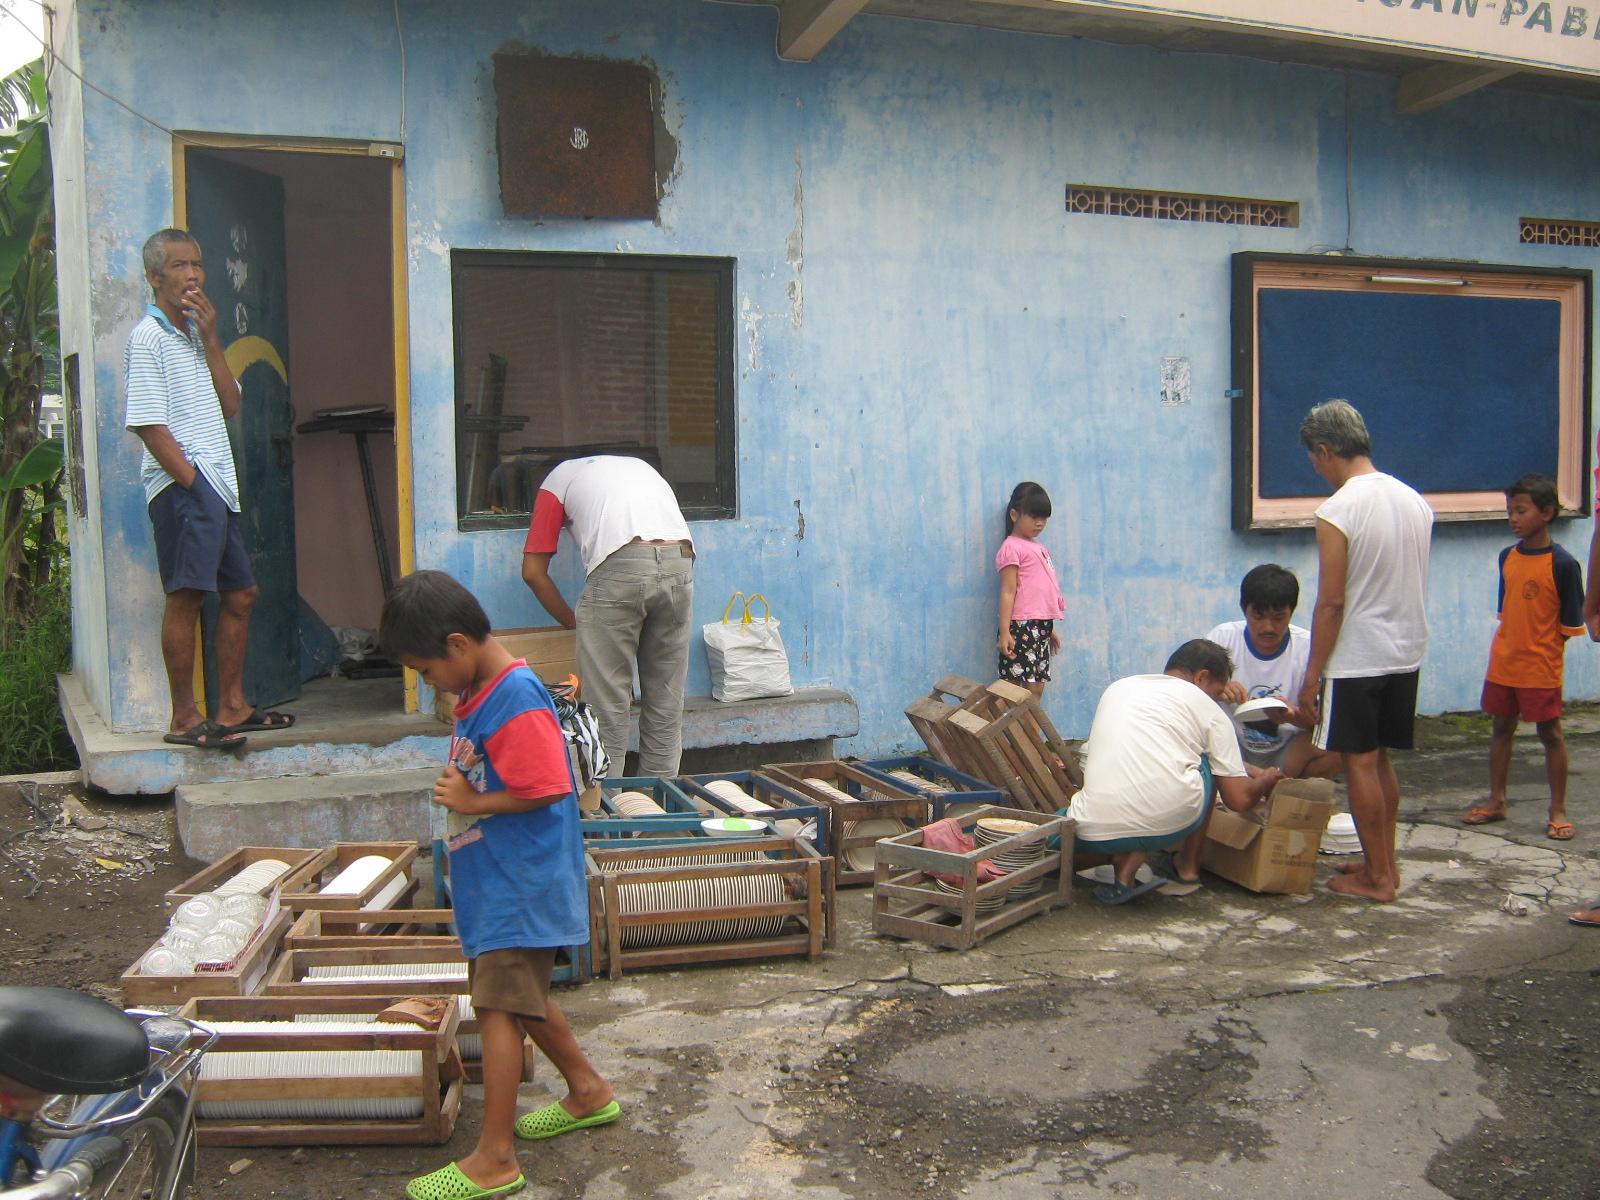 Kampoeng Jembangan: Kerja Bakti Bersih-Bersih Gudang Inventaris